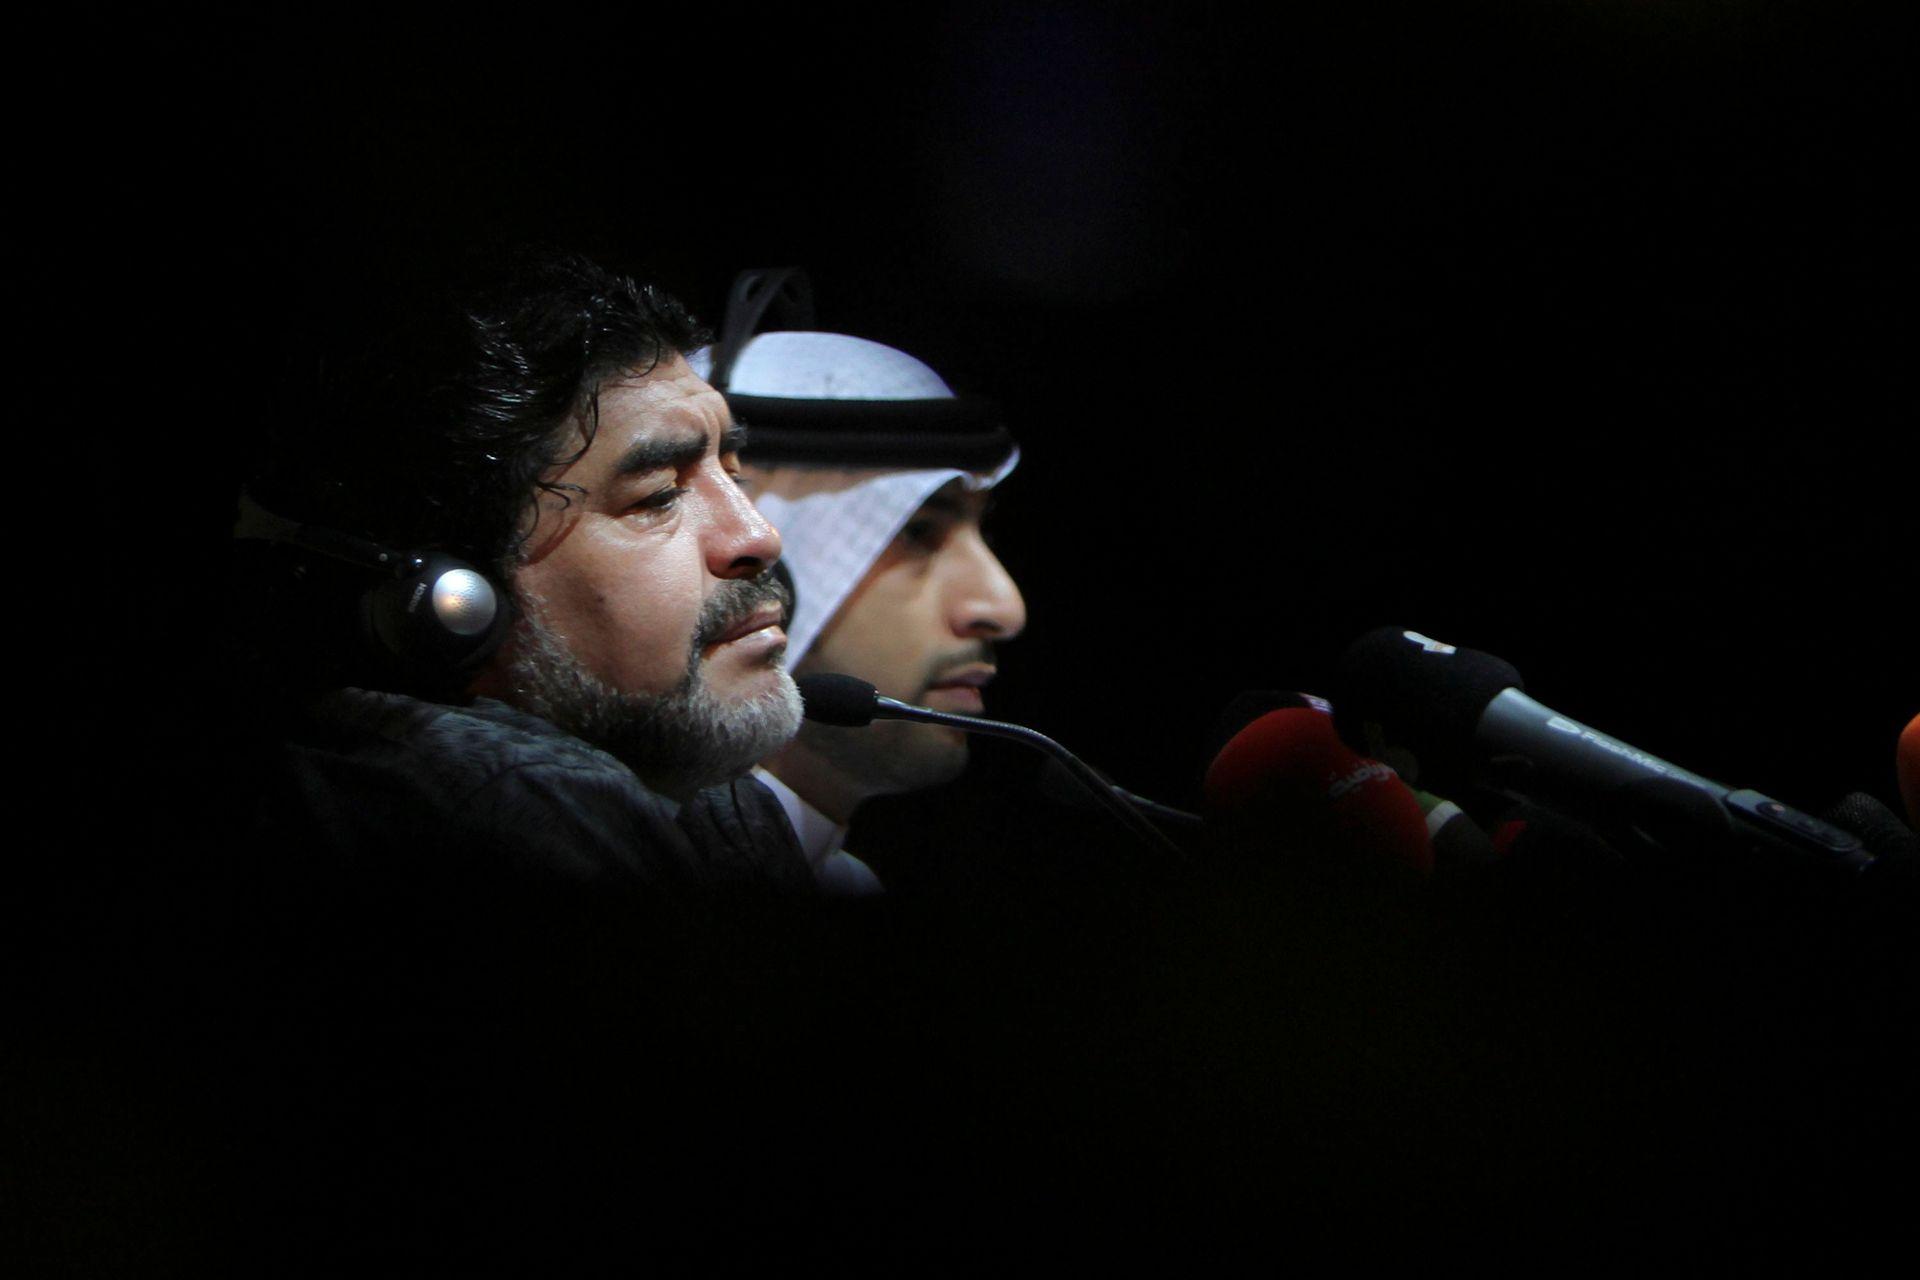 Diego entrenó al club Al Wasl de Emiratos Árabes en 2011